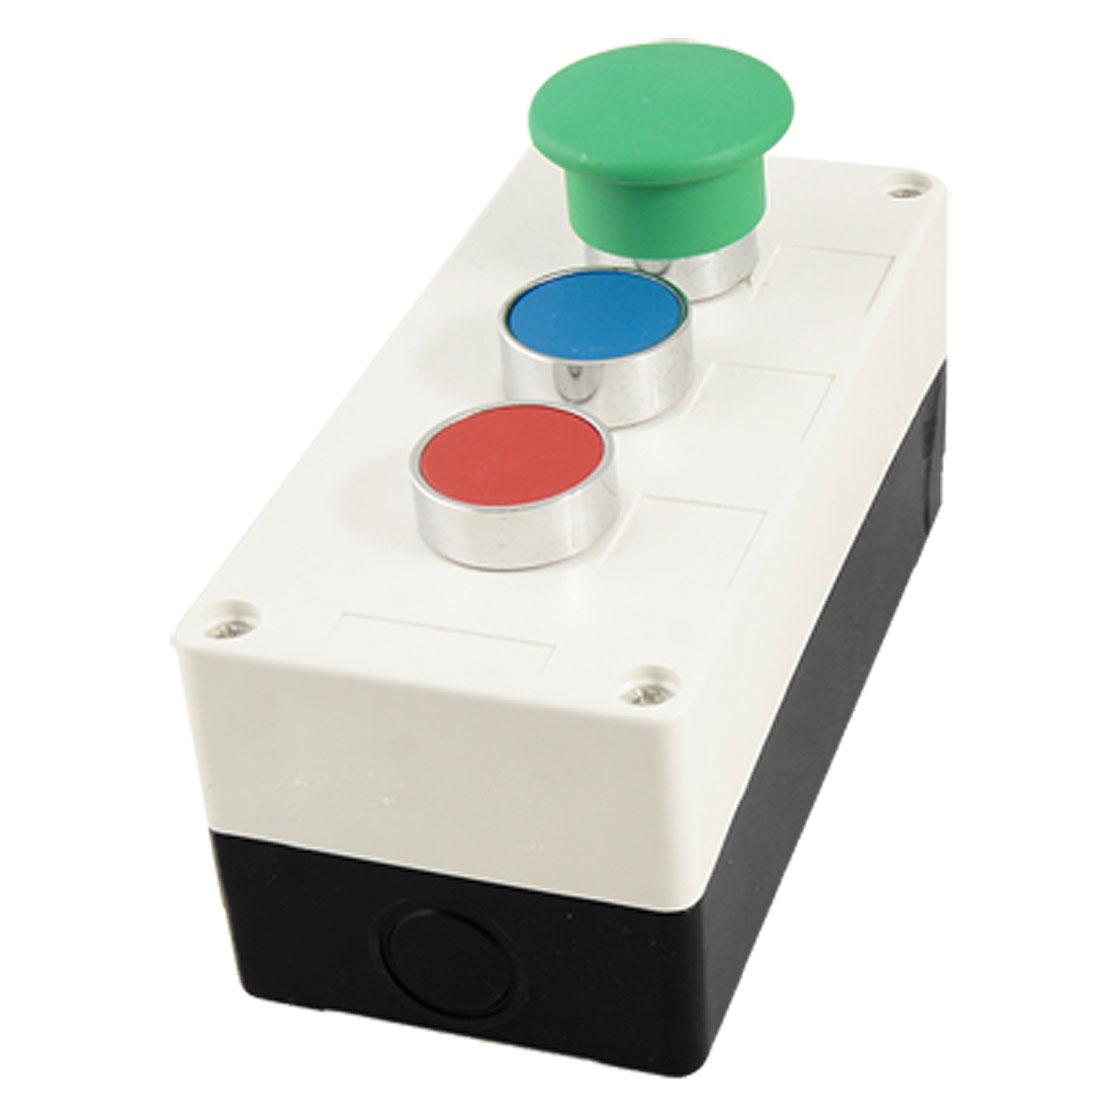 AC 240V 400V Green Mushroom Round Red Blue Momentary Switch Push Button Station